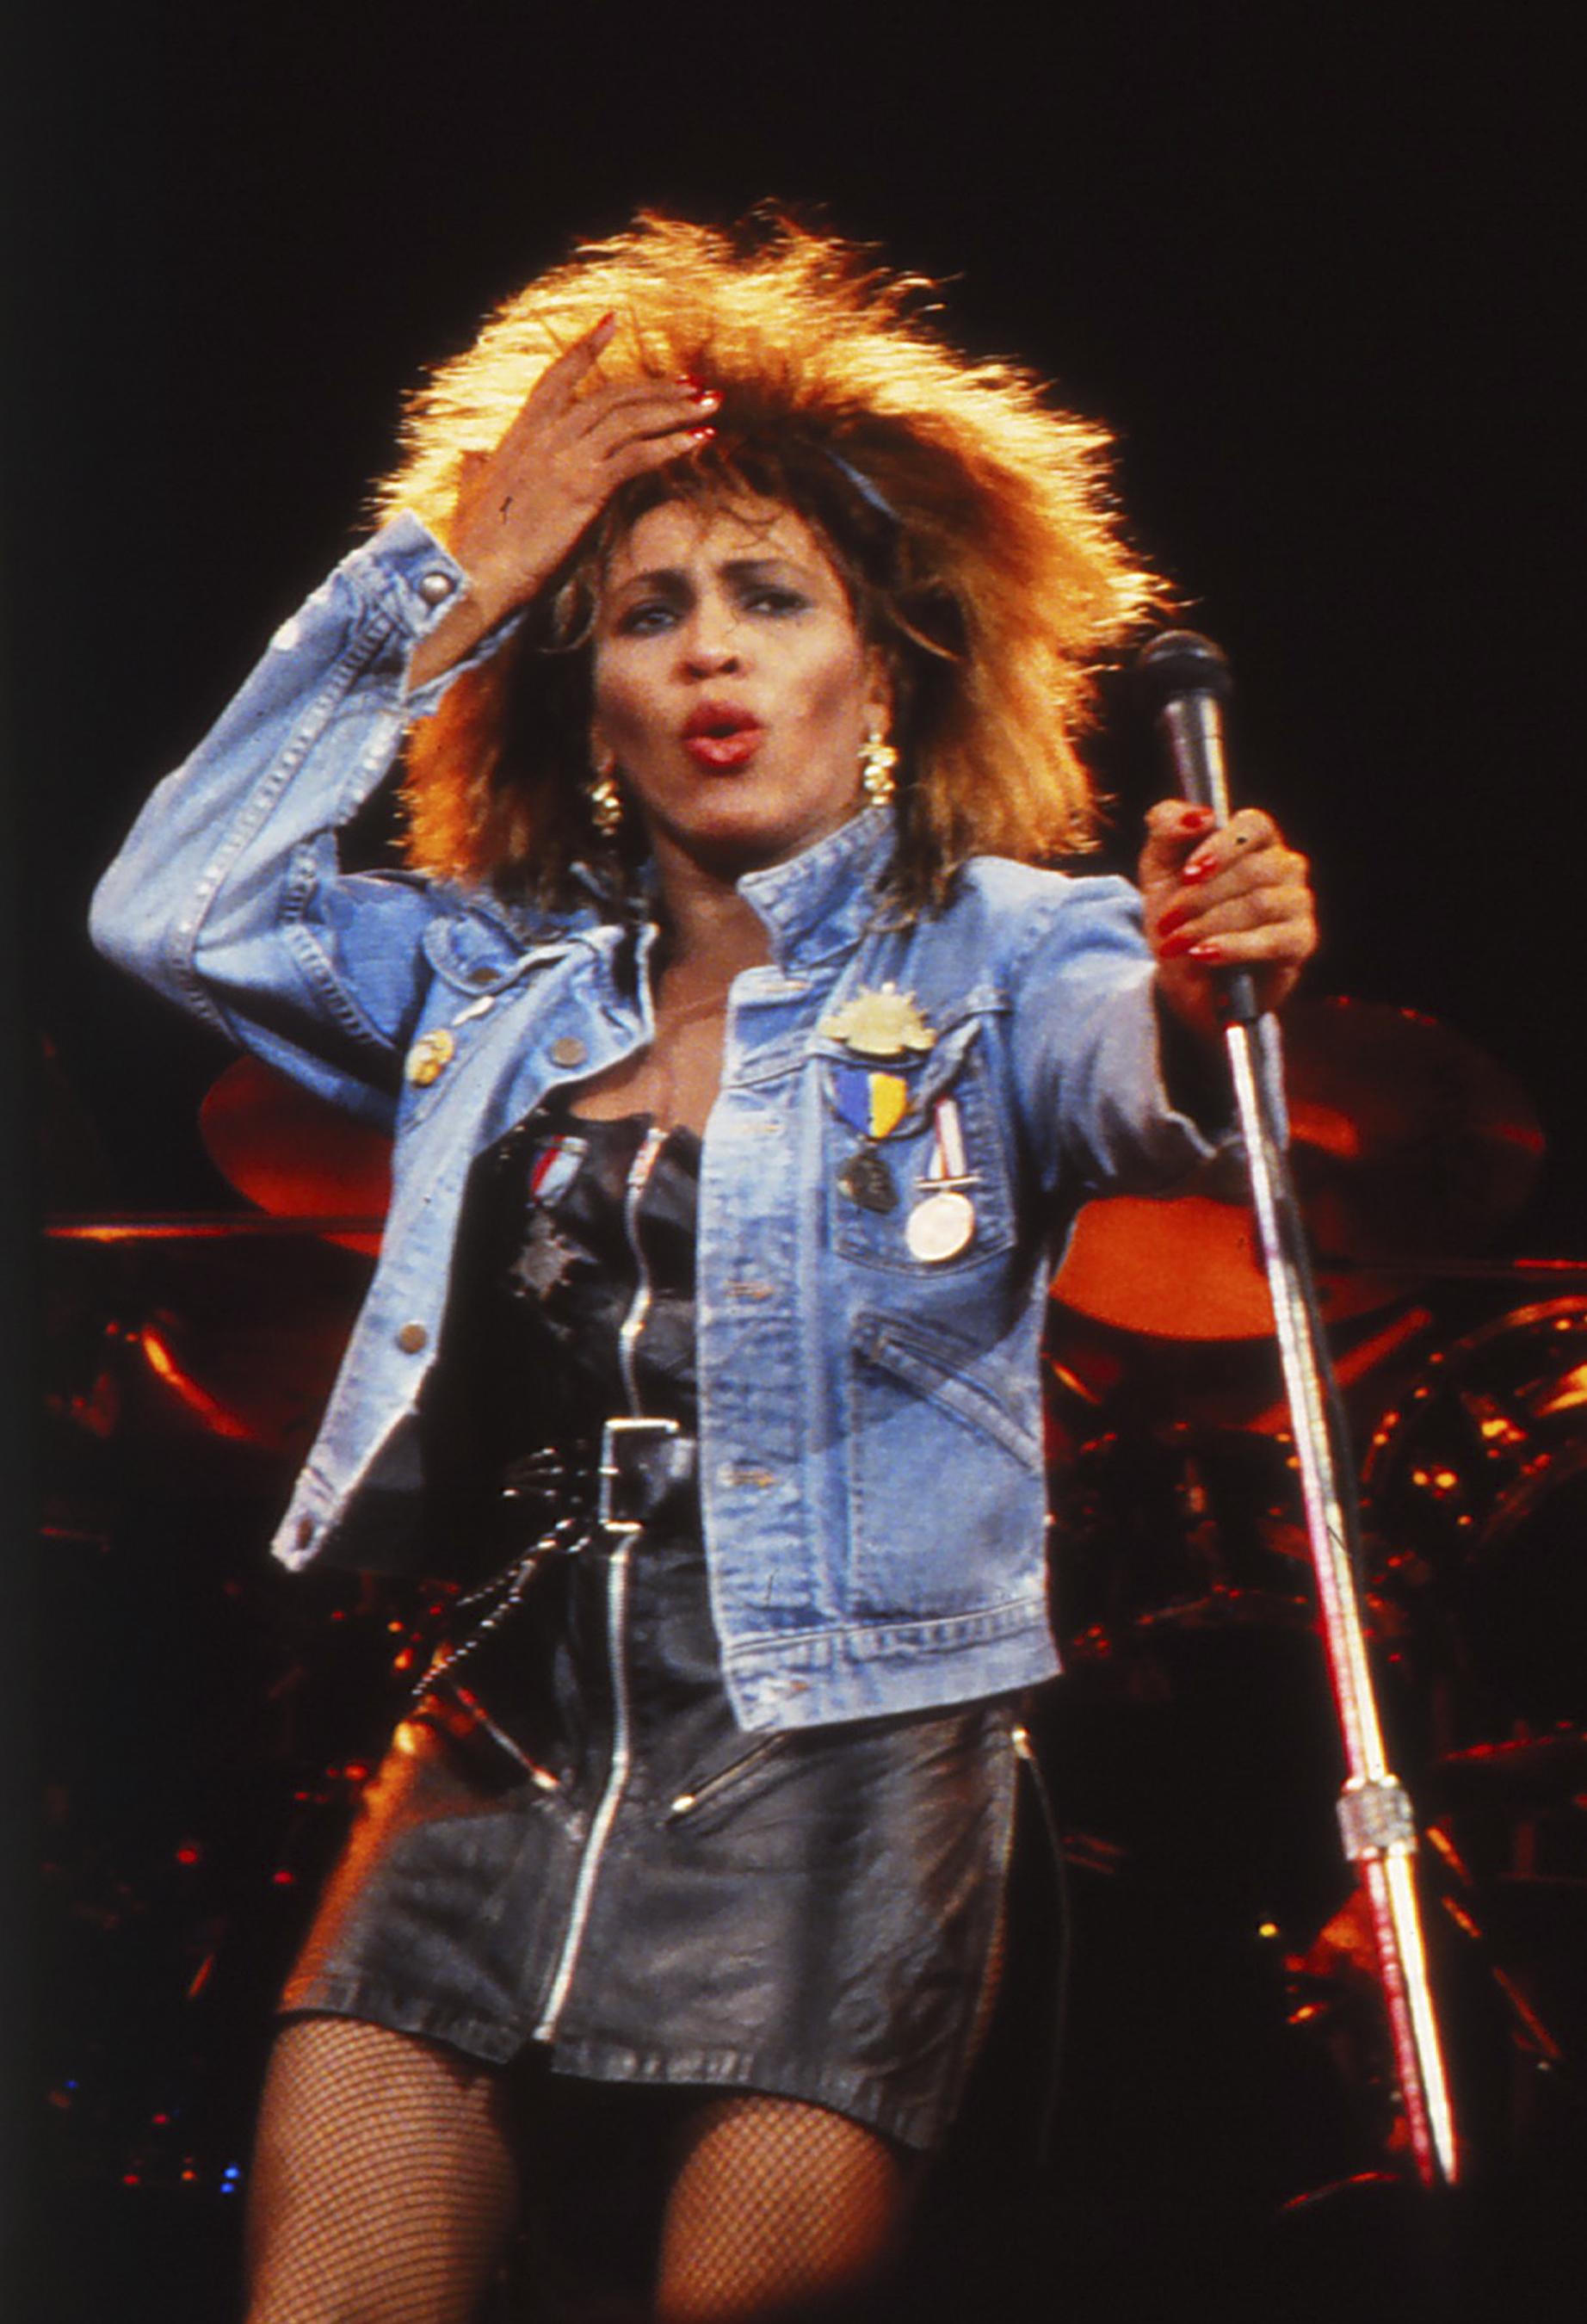 Tina Turner performance photo color